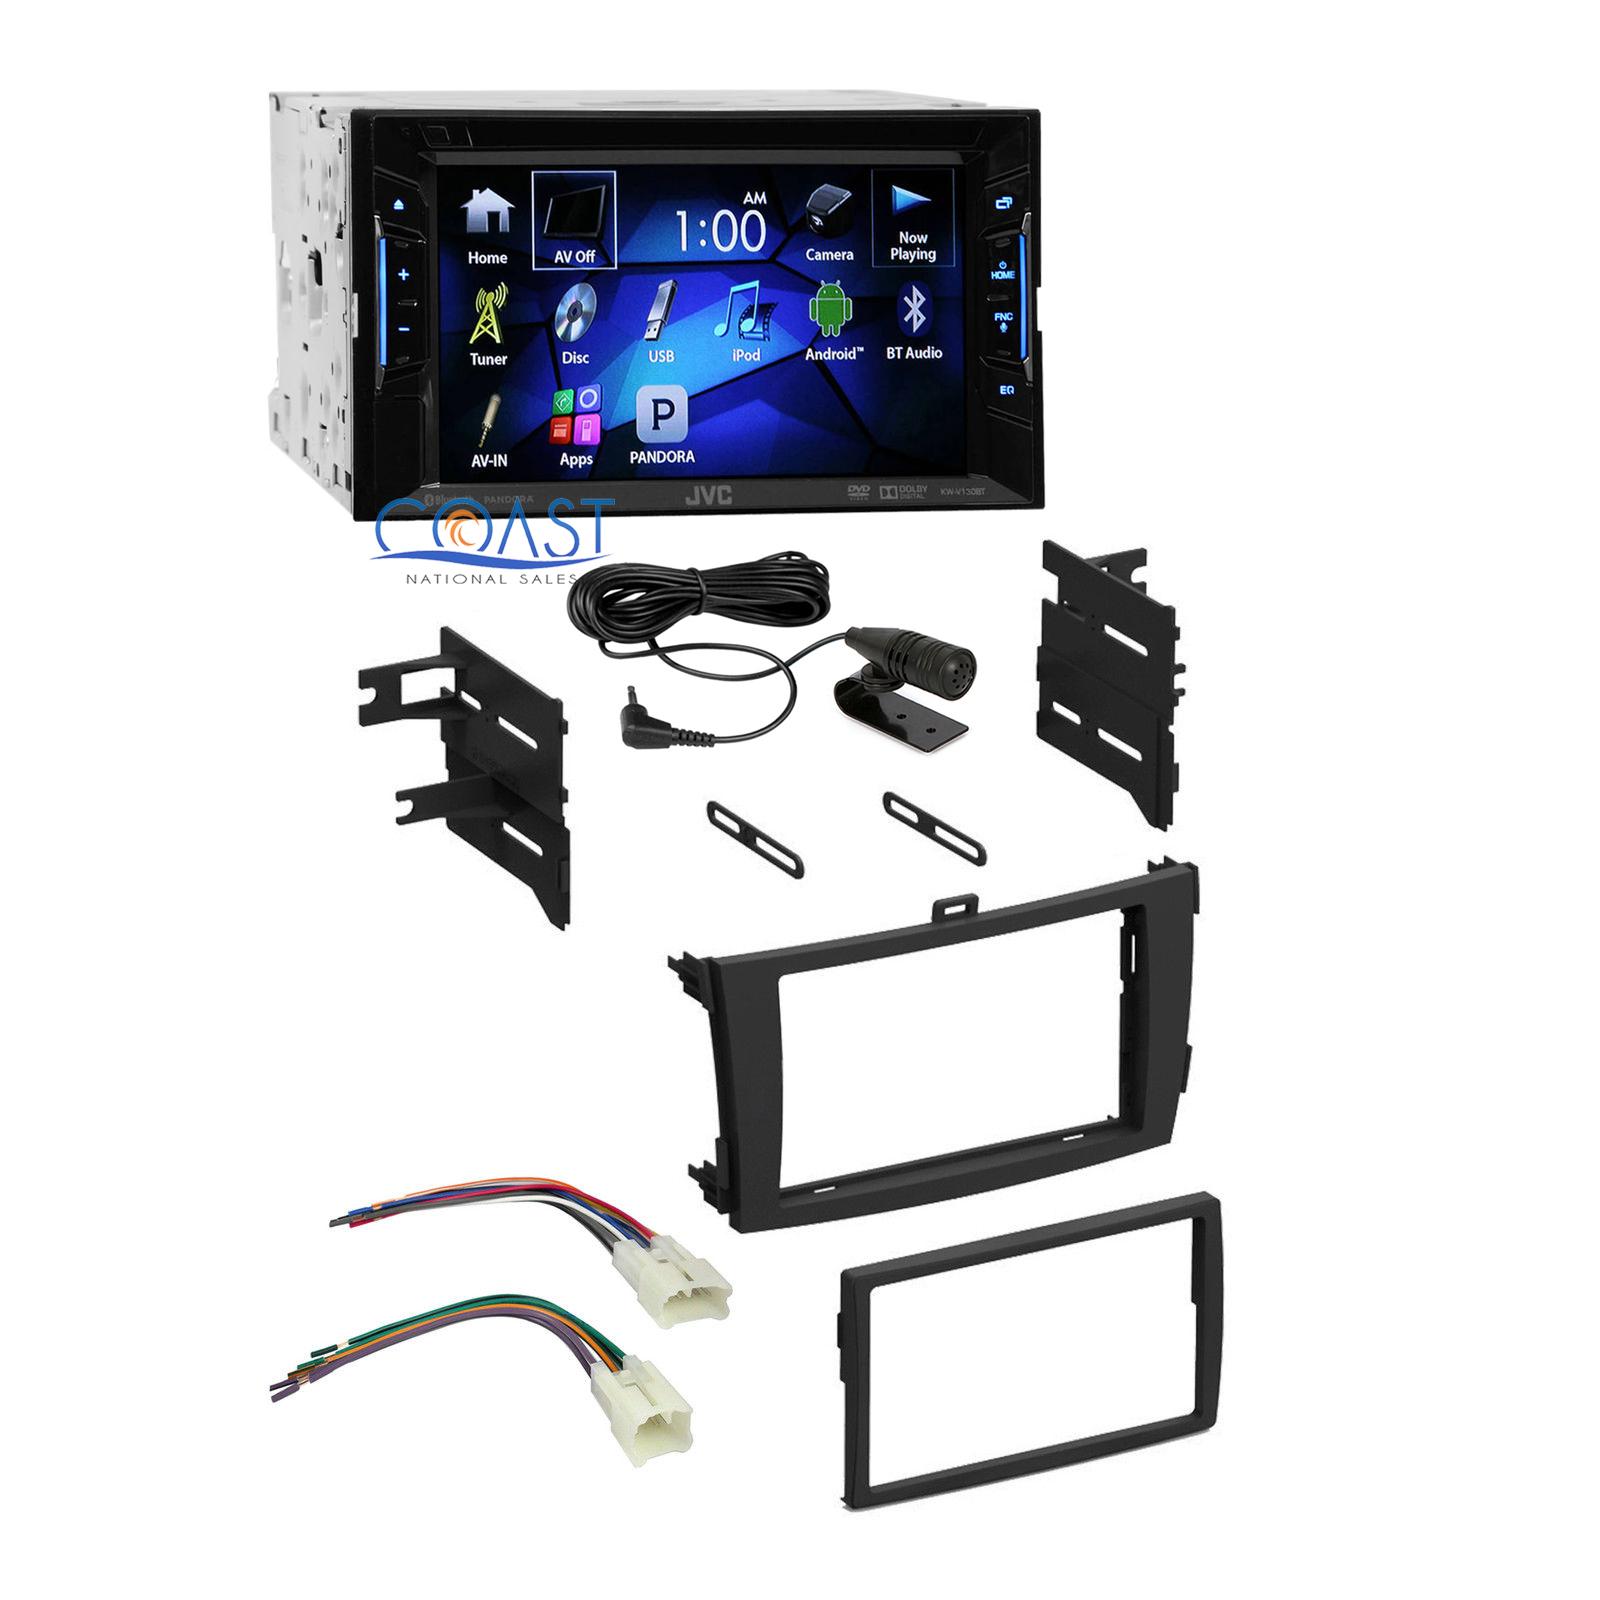 jvc car radio stereo din dash kit wire harness for 09 13 toyota corolla ebay